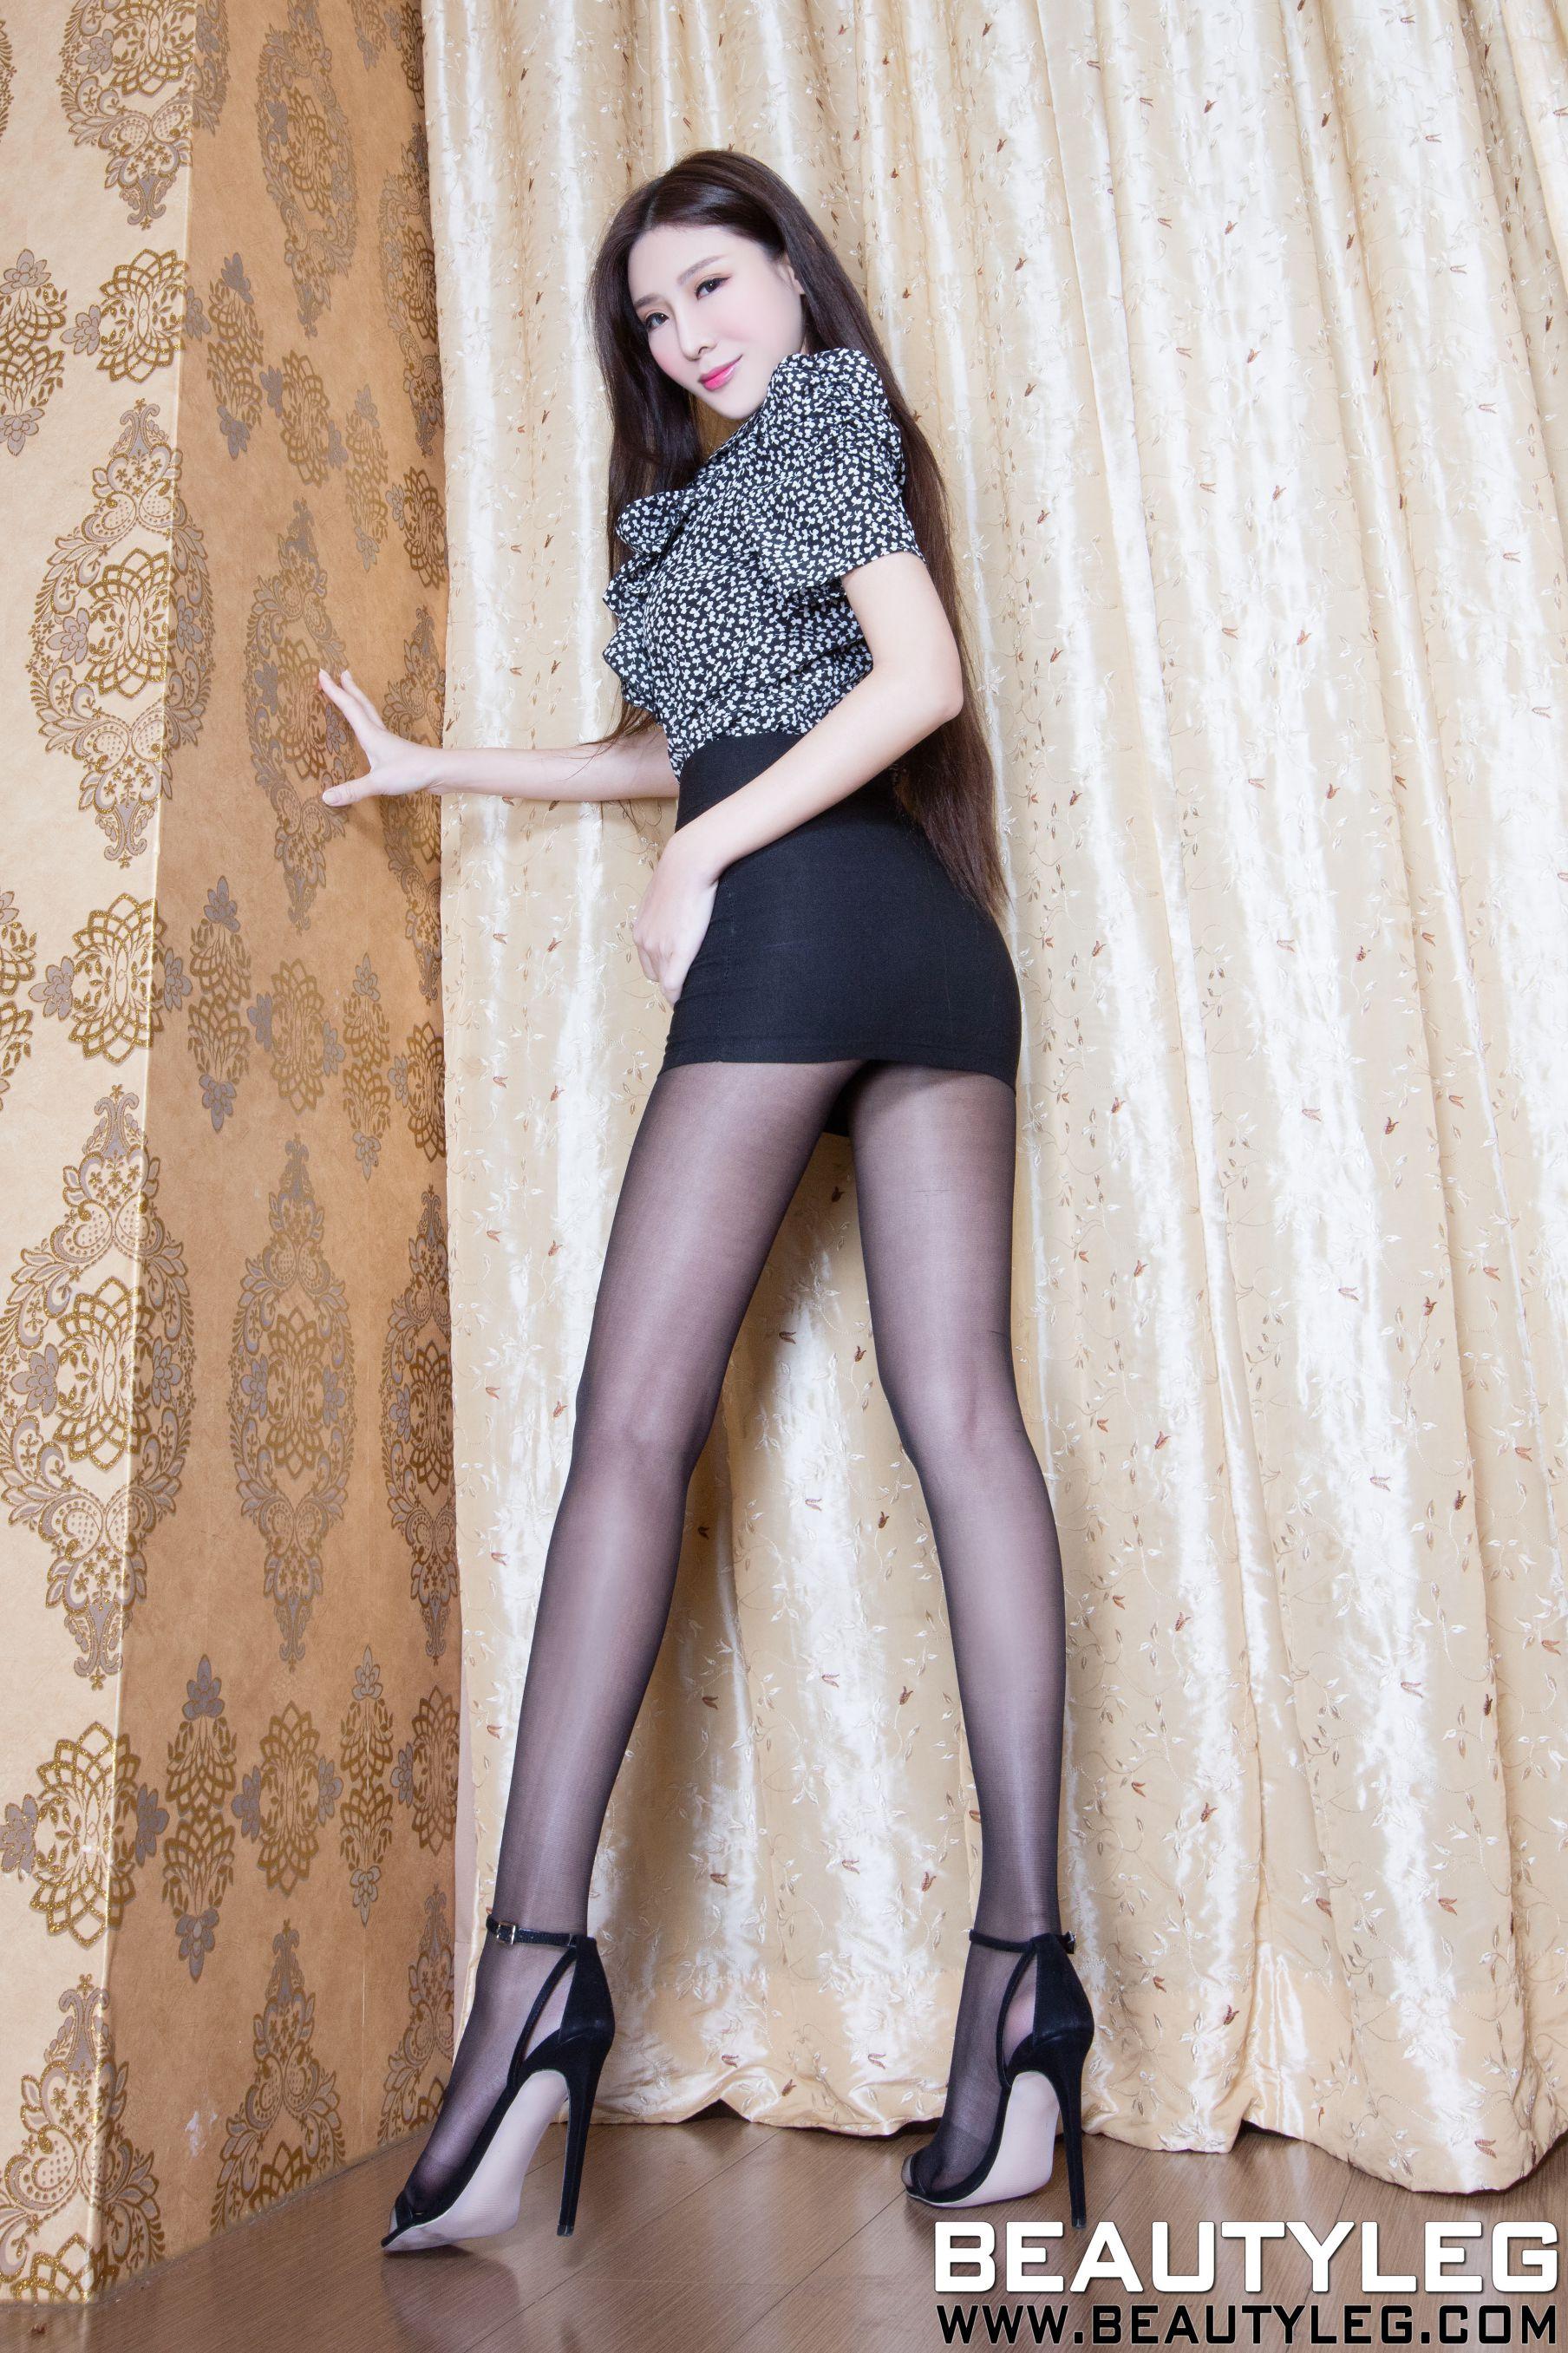 VOL.1995 [Beautyleg]长腿美女:李小星(Beautyleg腿模Xin)高品质写真套图(45P)